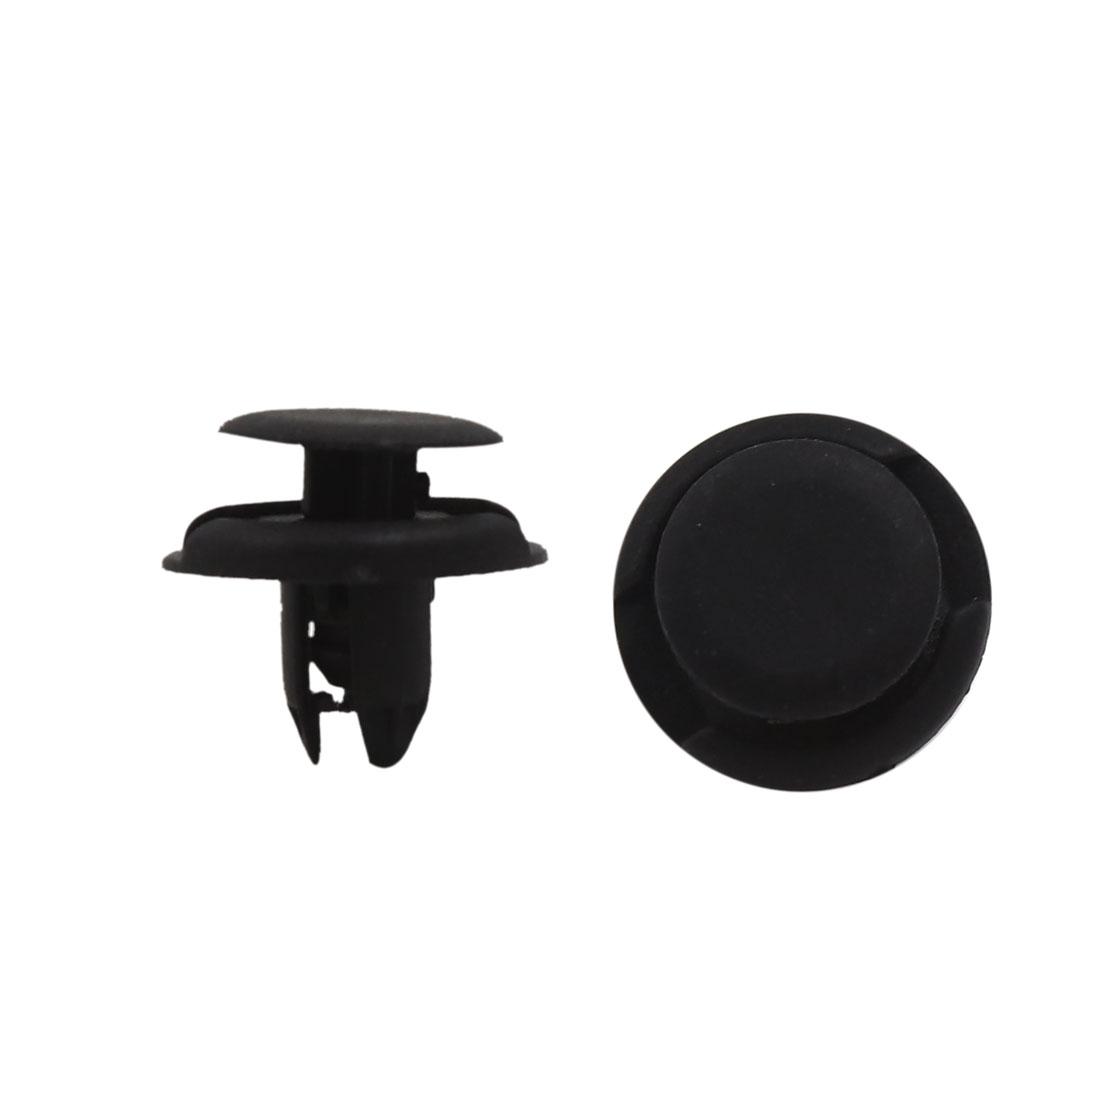 30 Pcs 8mm Hole 19mm Head Plastic Rivets Fastener Push Clips for Bumper Fender